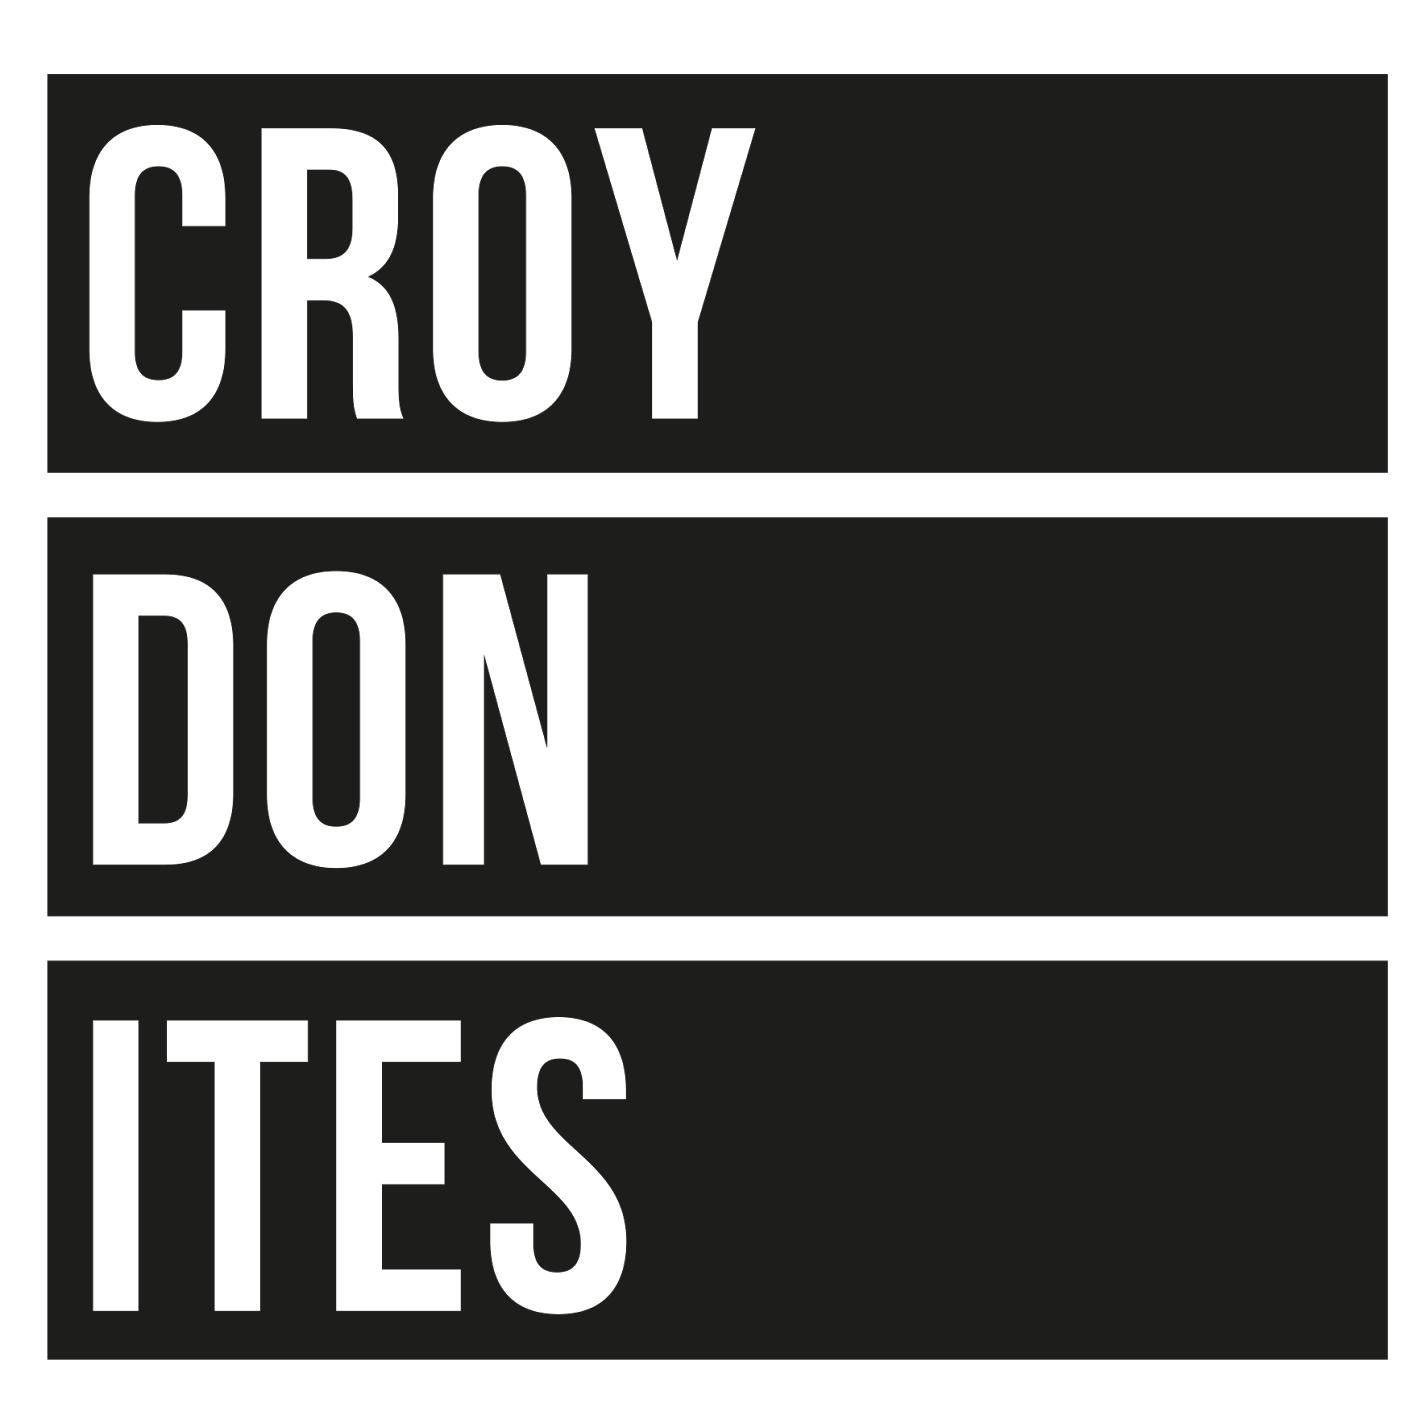 Croydonites Square bw.png